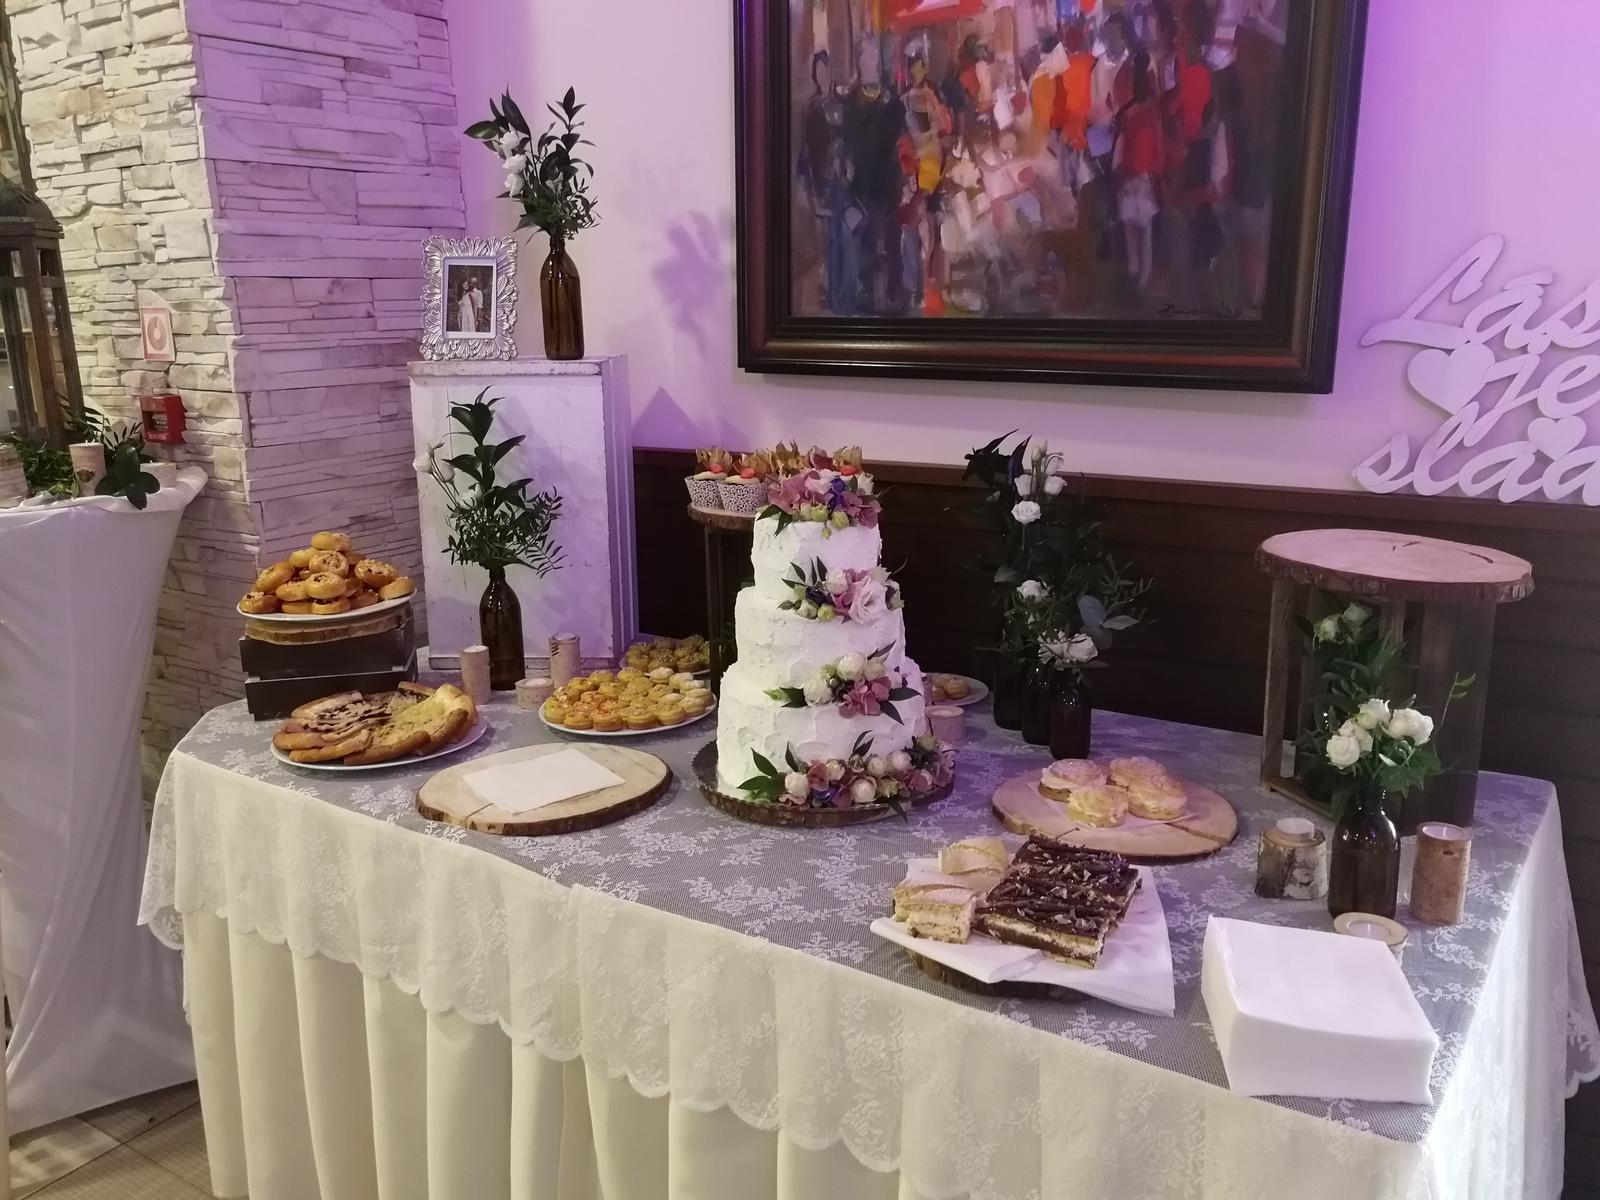 Svadba 29.9.2018 Hotel Kontakt - Obrázok č. 11